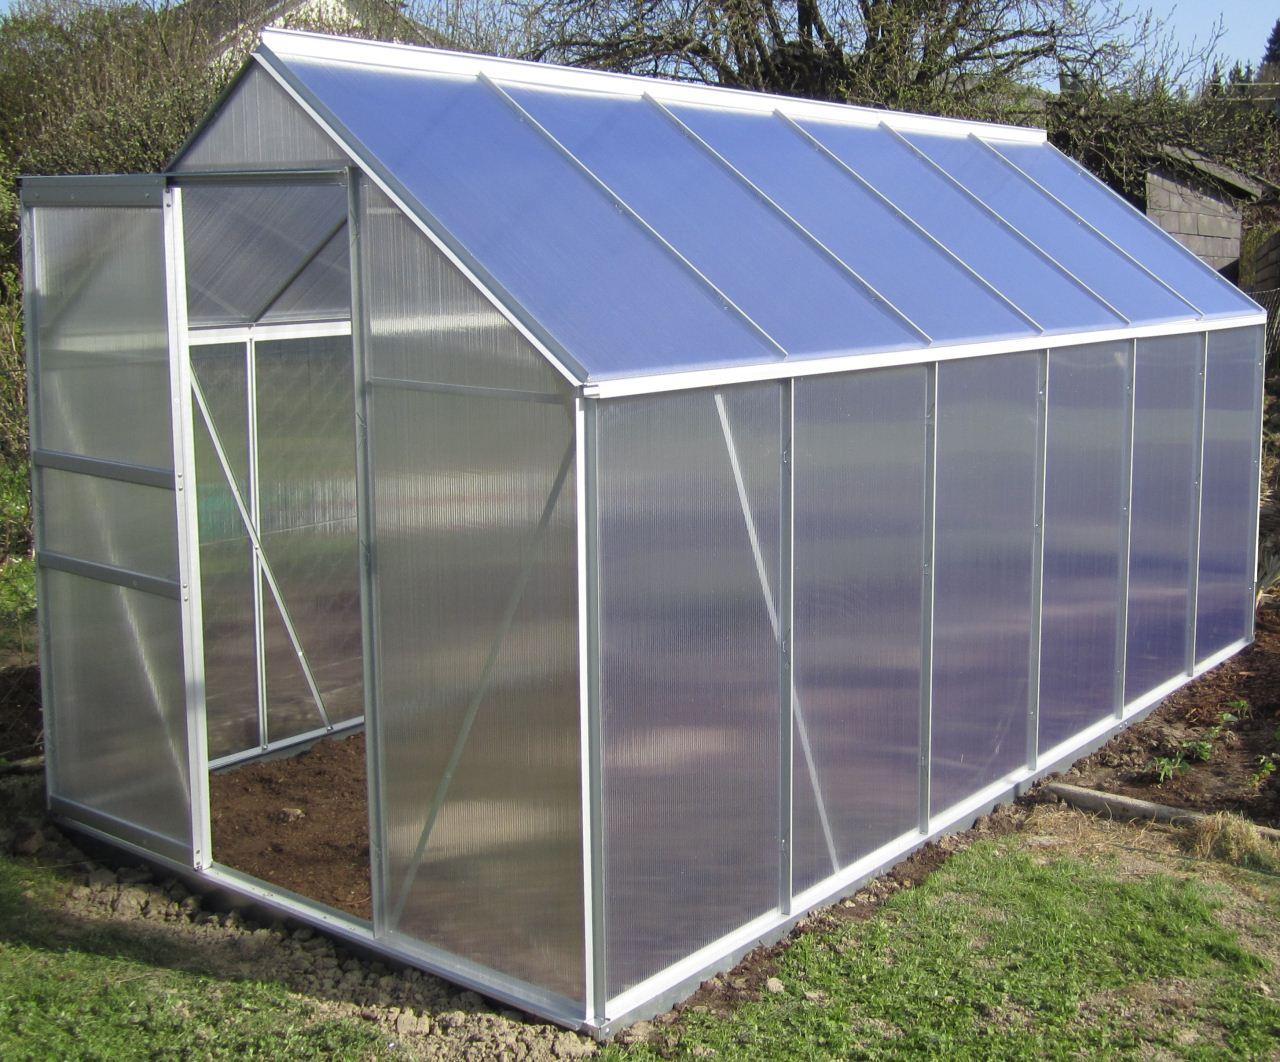 7 05m alu aluminium gew chshaus glashaus tomatenhaus 6mm hohlkammerstegplatten platten made. Black Bedroom Furniture Sets. Home Design Ideas